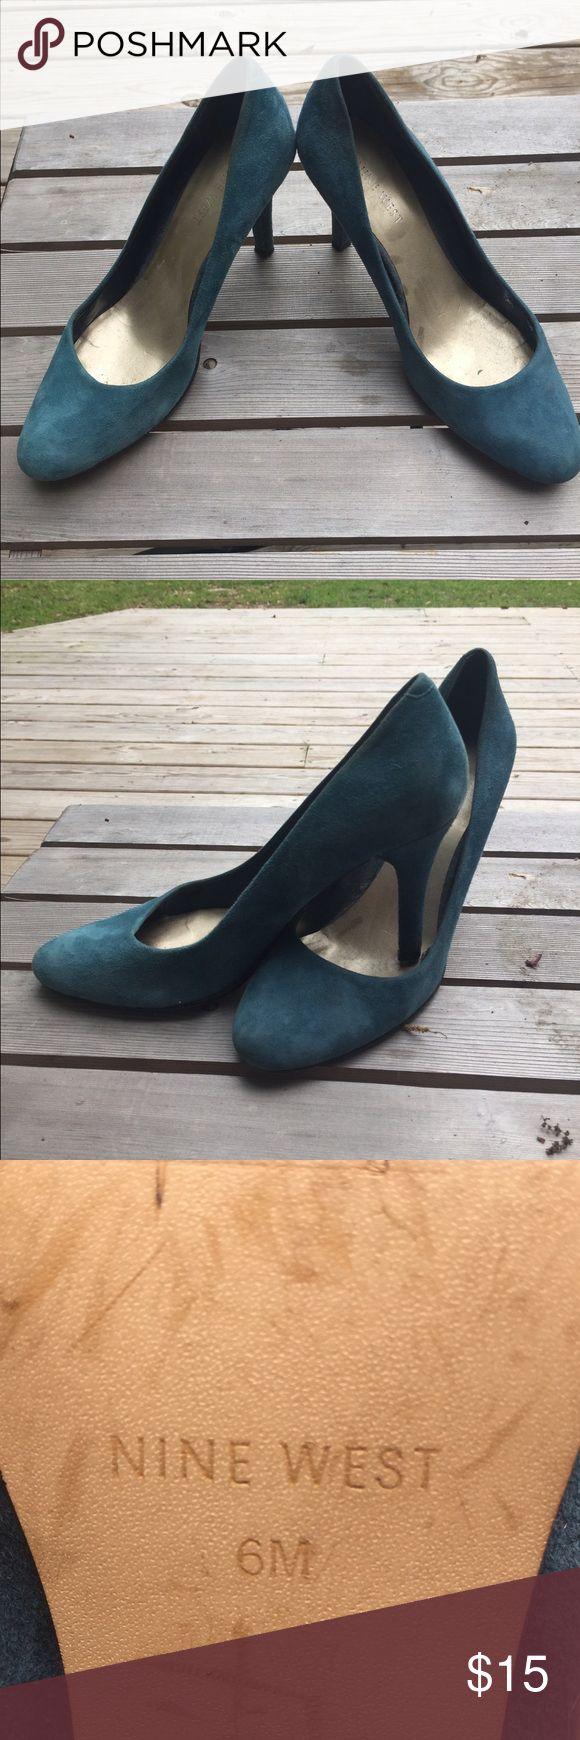 Don't Step on my Blue Suede Shoes... Pumps! Nine West Blue Suede pumps - size 6 - good condition. Nine West Shoes Heels